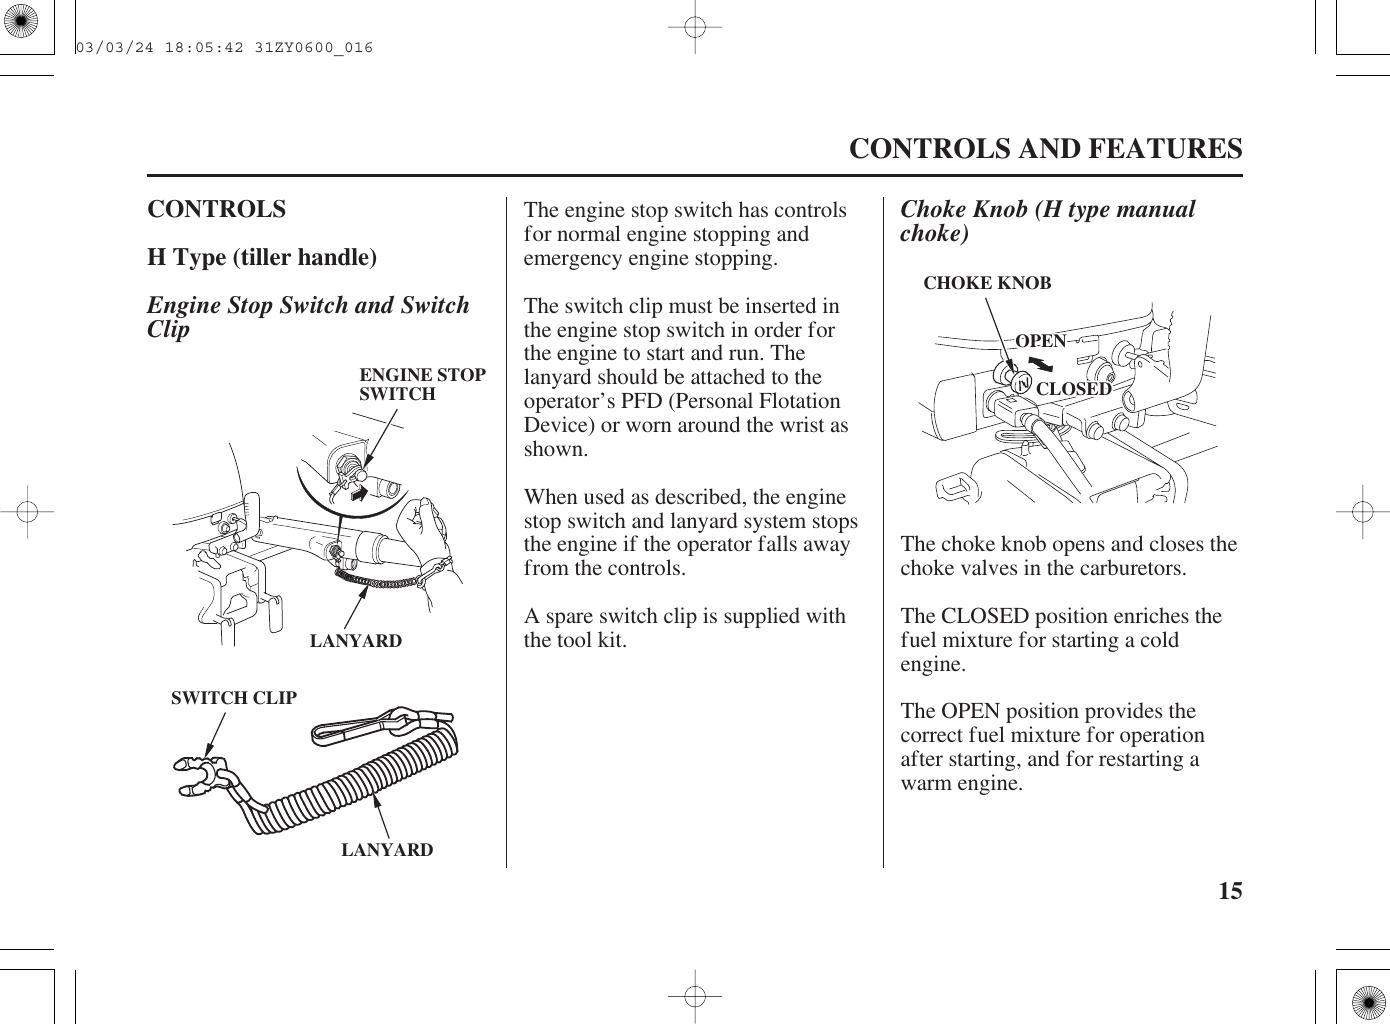 Honda Bf15 Balj 1000001 1099999 Owners Manual on